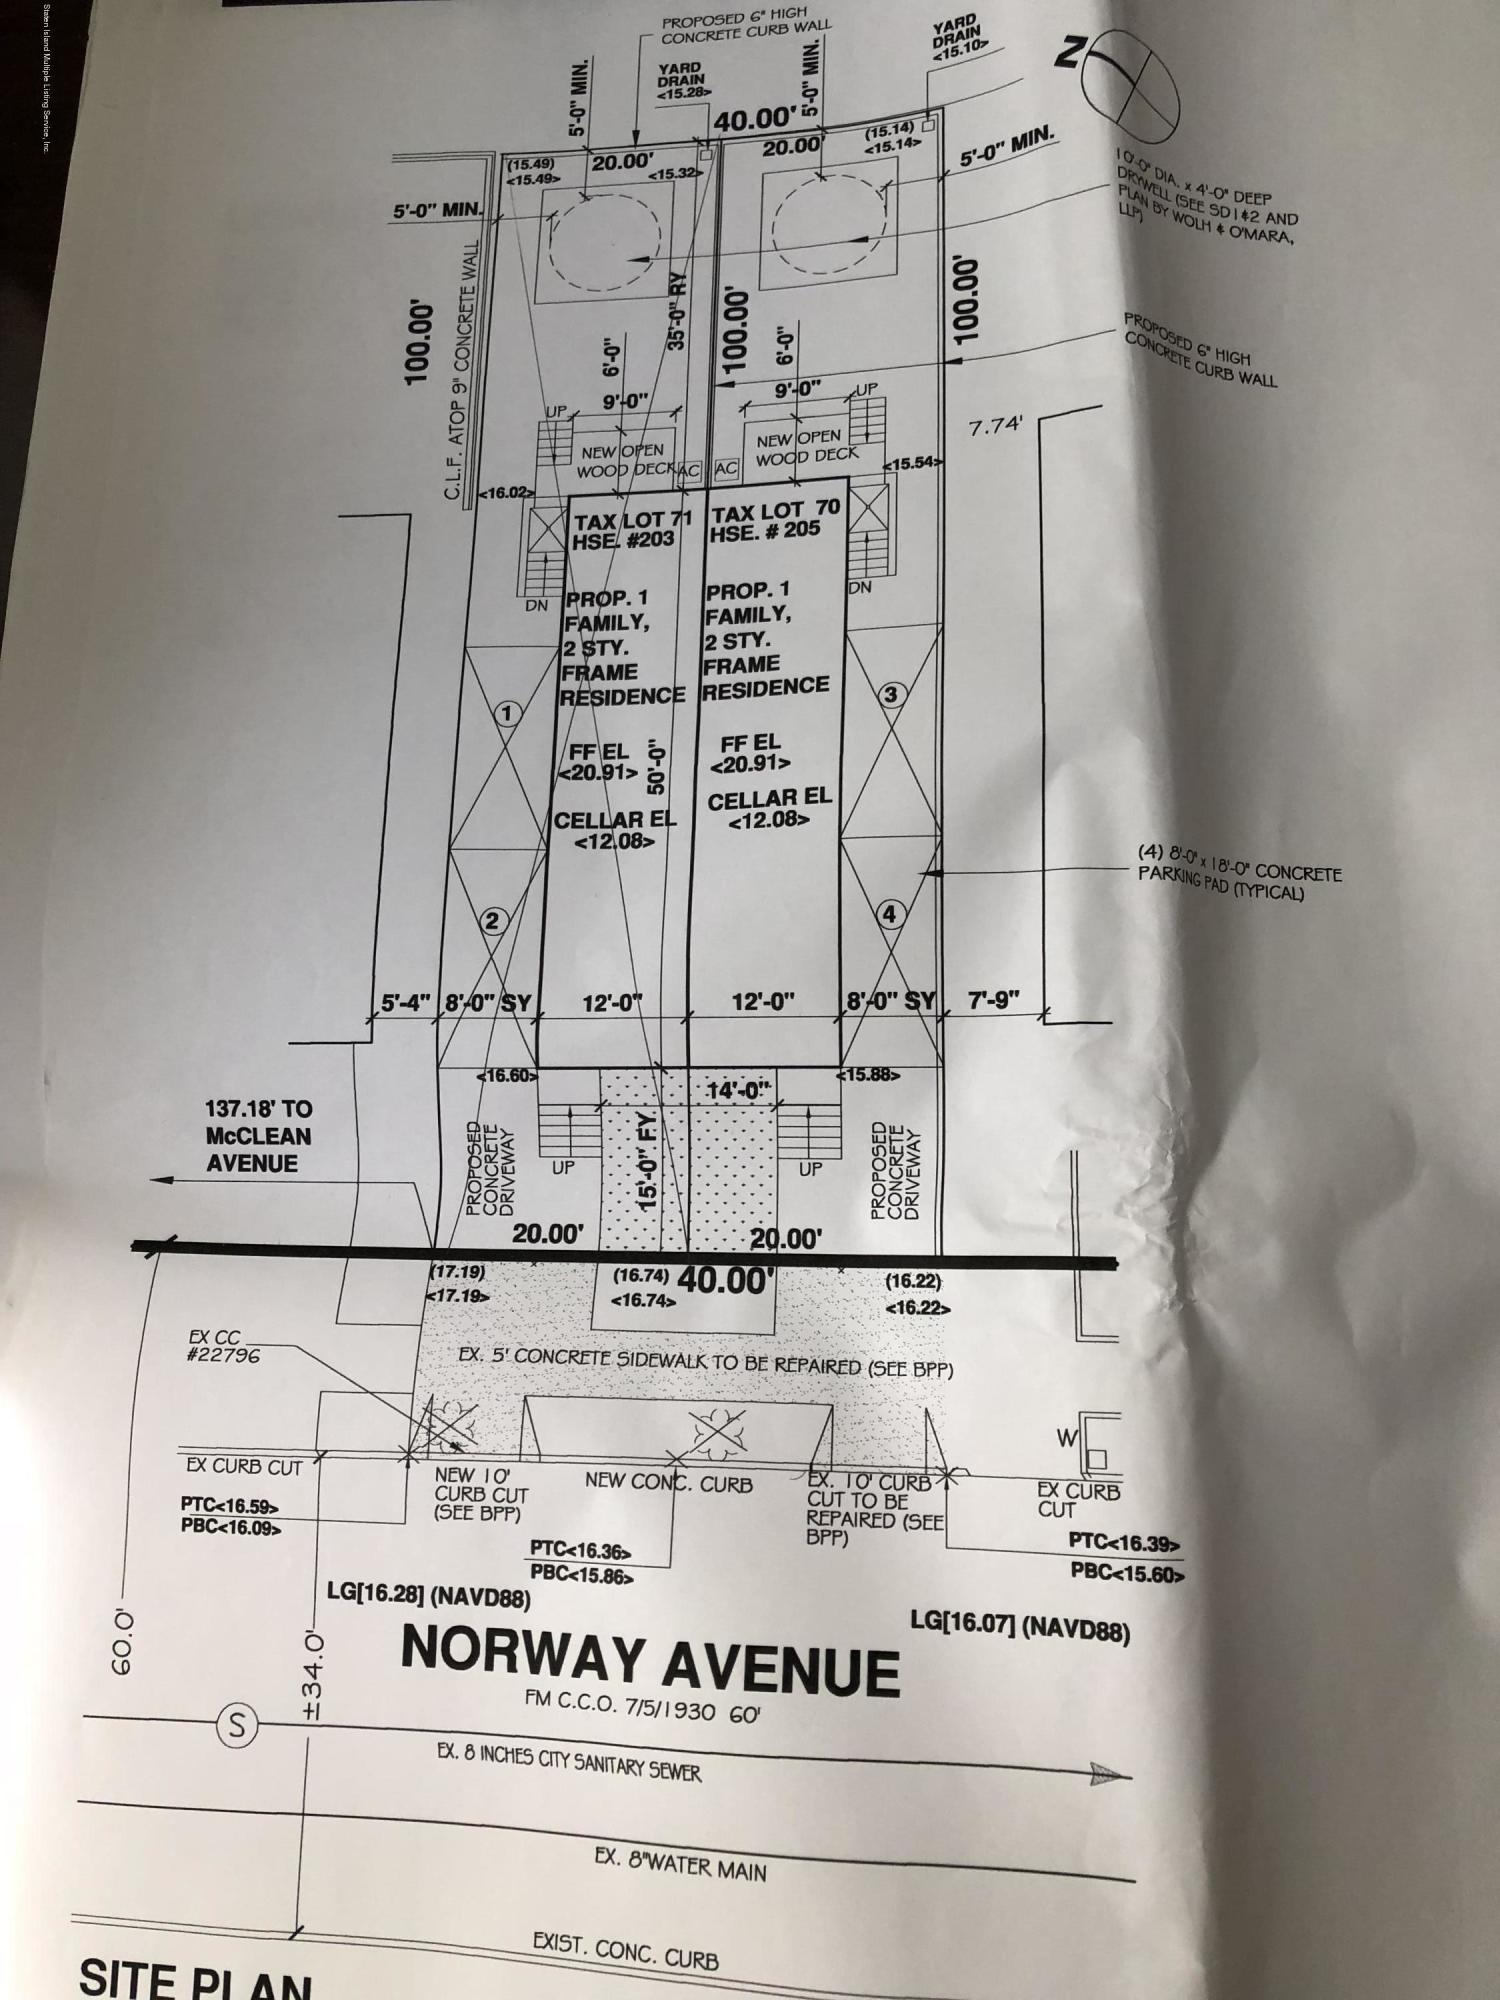 Single Family - Semi-Attached 205 Norway Avenue  Staten Island, NY 10305, MLS-1129630-6